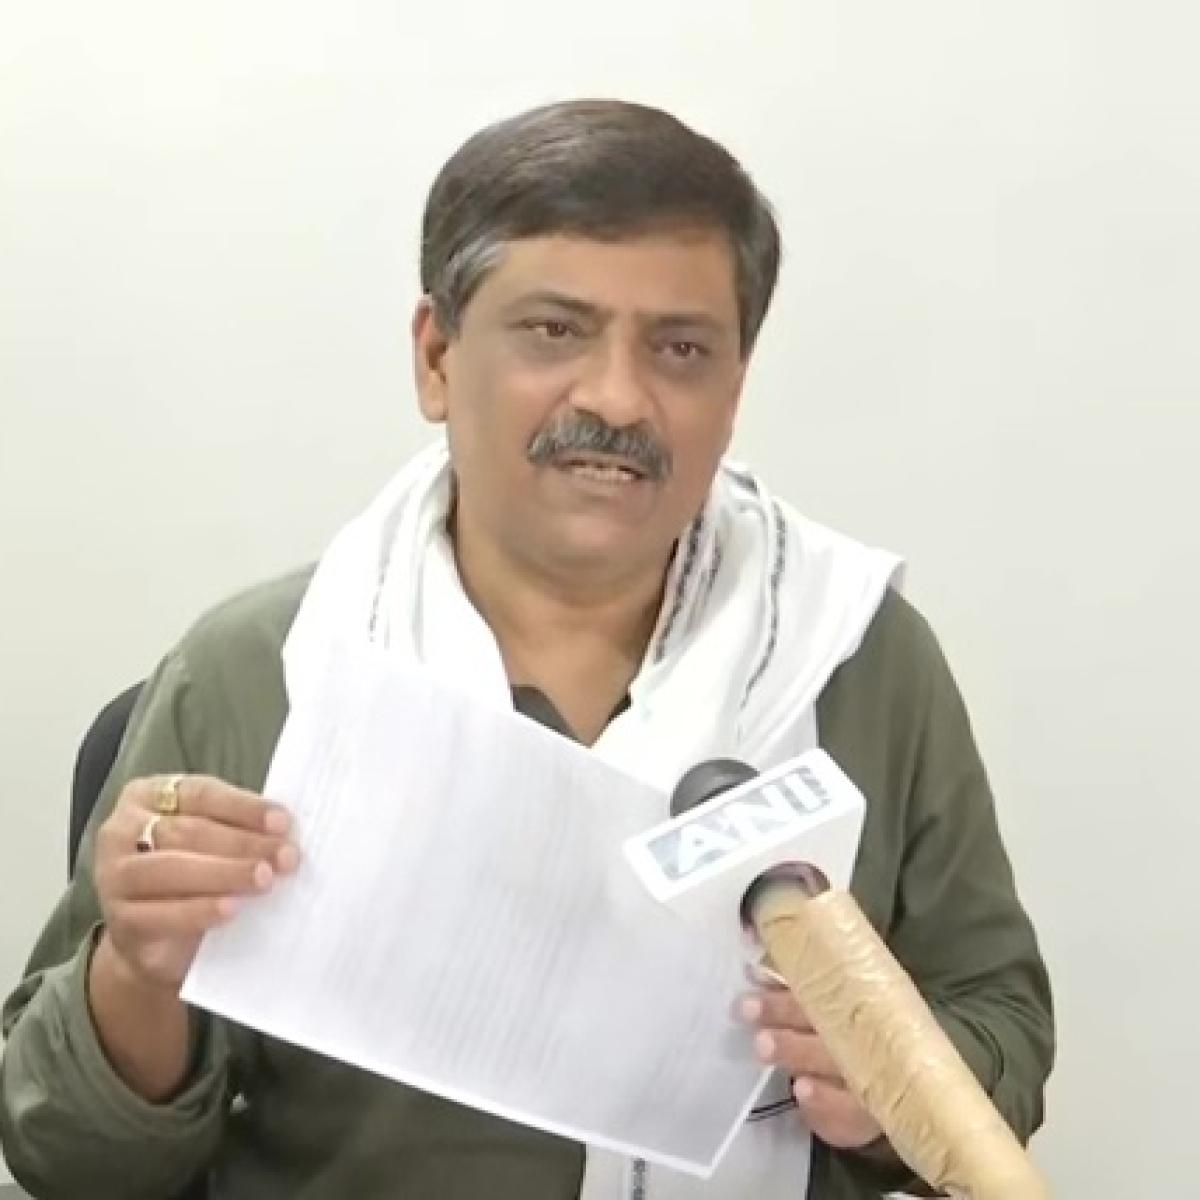 Bihar Minister accuses Delhi govt of asking for reimbursement of money for tickets of migrant workers from Bihar govt